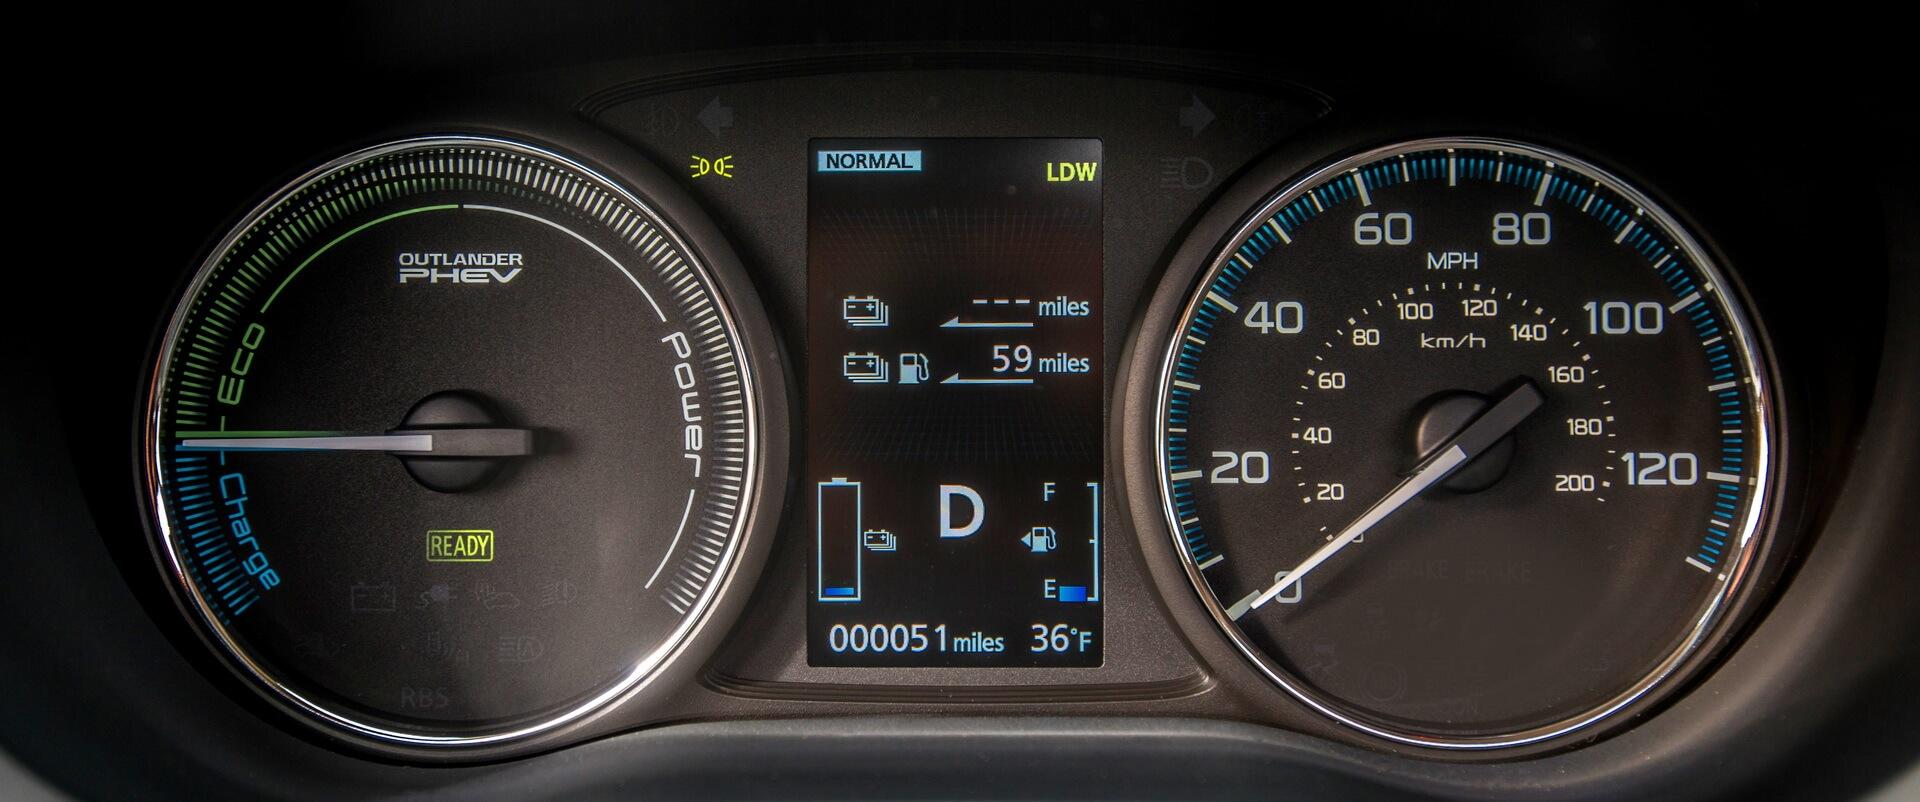 Фотография экоавто Mitsubishi Outlander PHEV 2016-2017 - фото 32